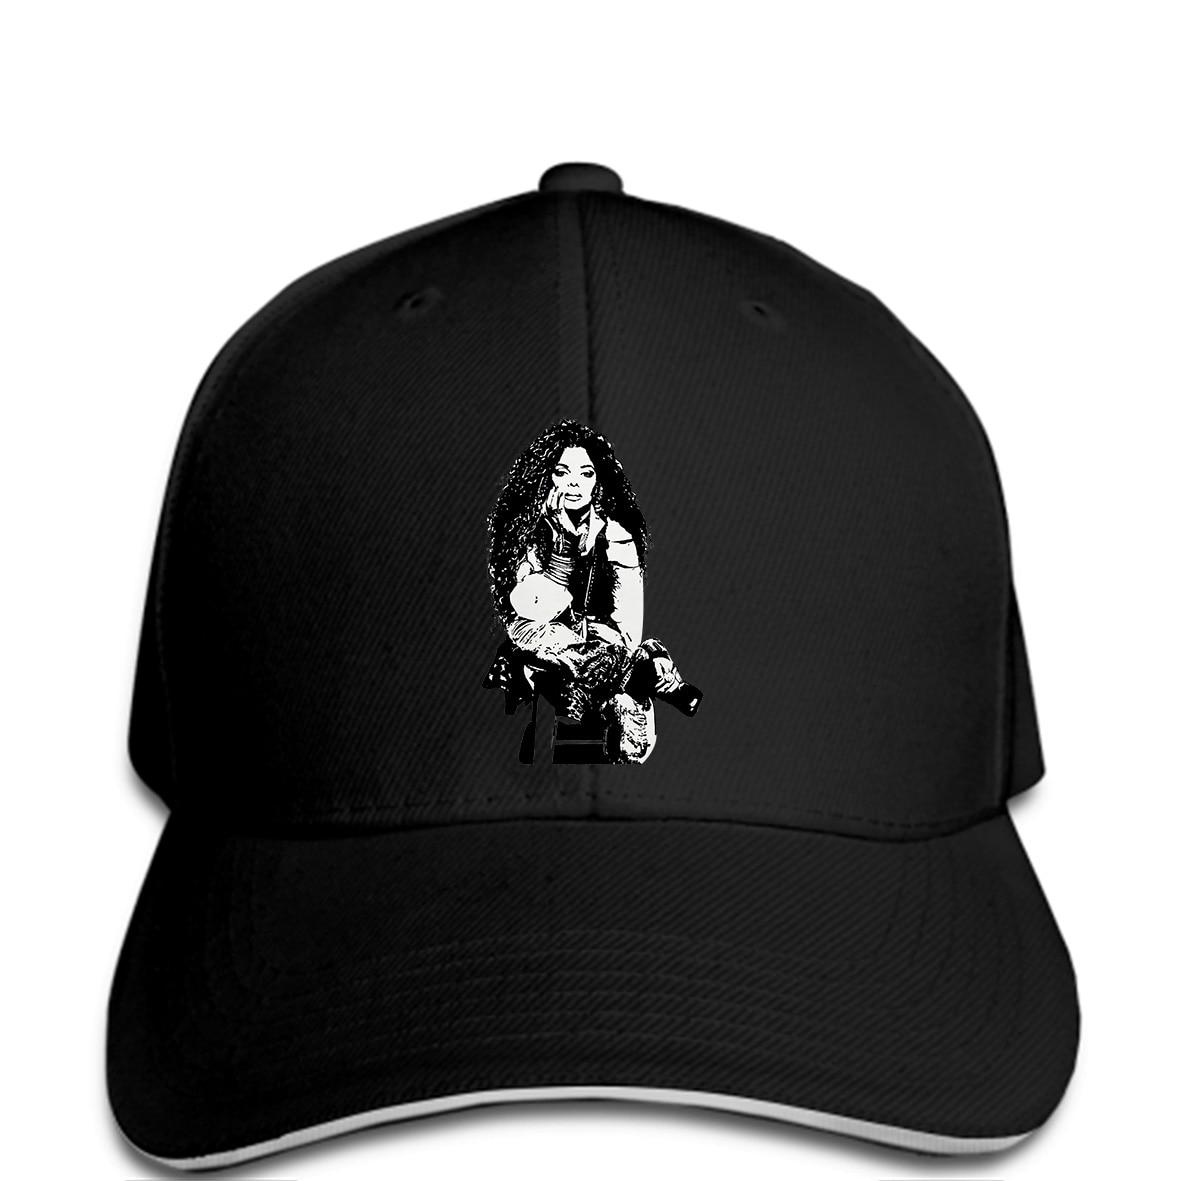 Men Baseball cap Janet Jackson Rock N Roll Unbreakable Logo Fashion funny  Hat novelty tsnapback women-in Baseball Caps from Apparel Accessories on ... baf1a078975